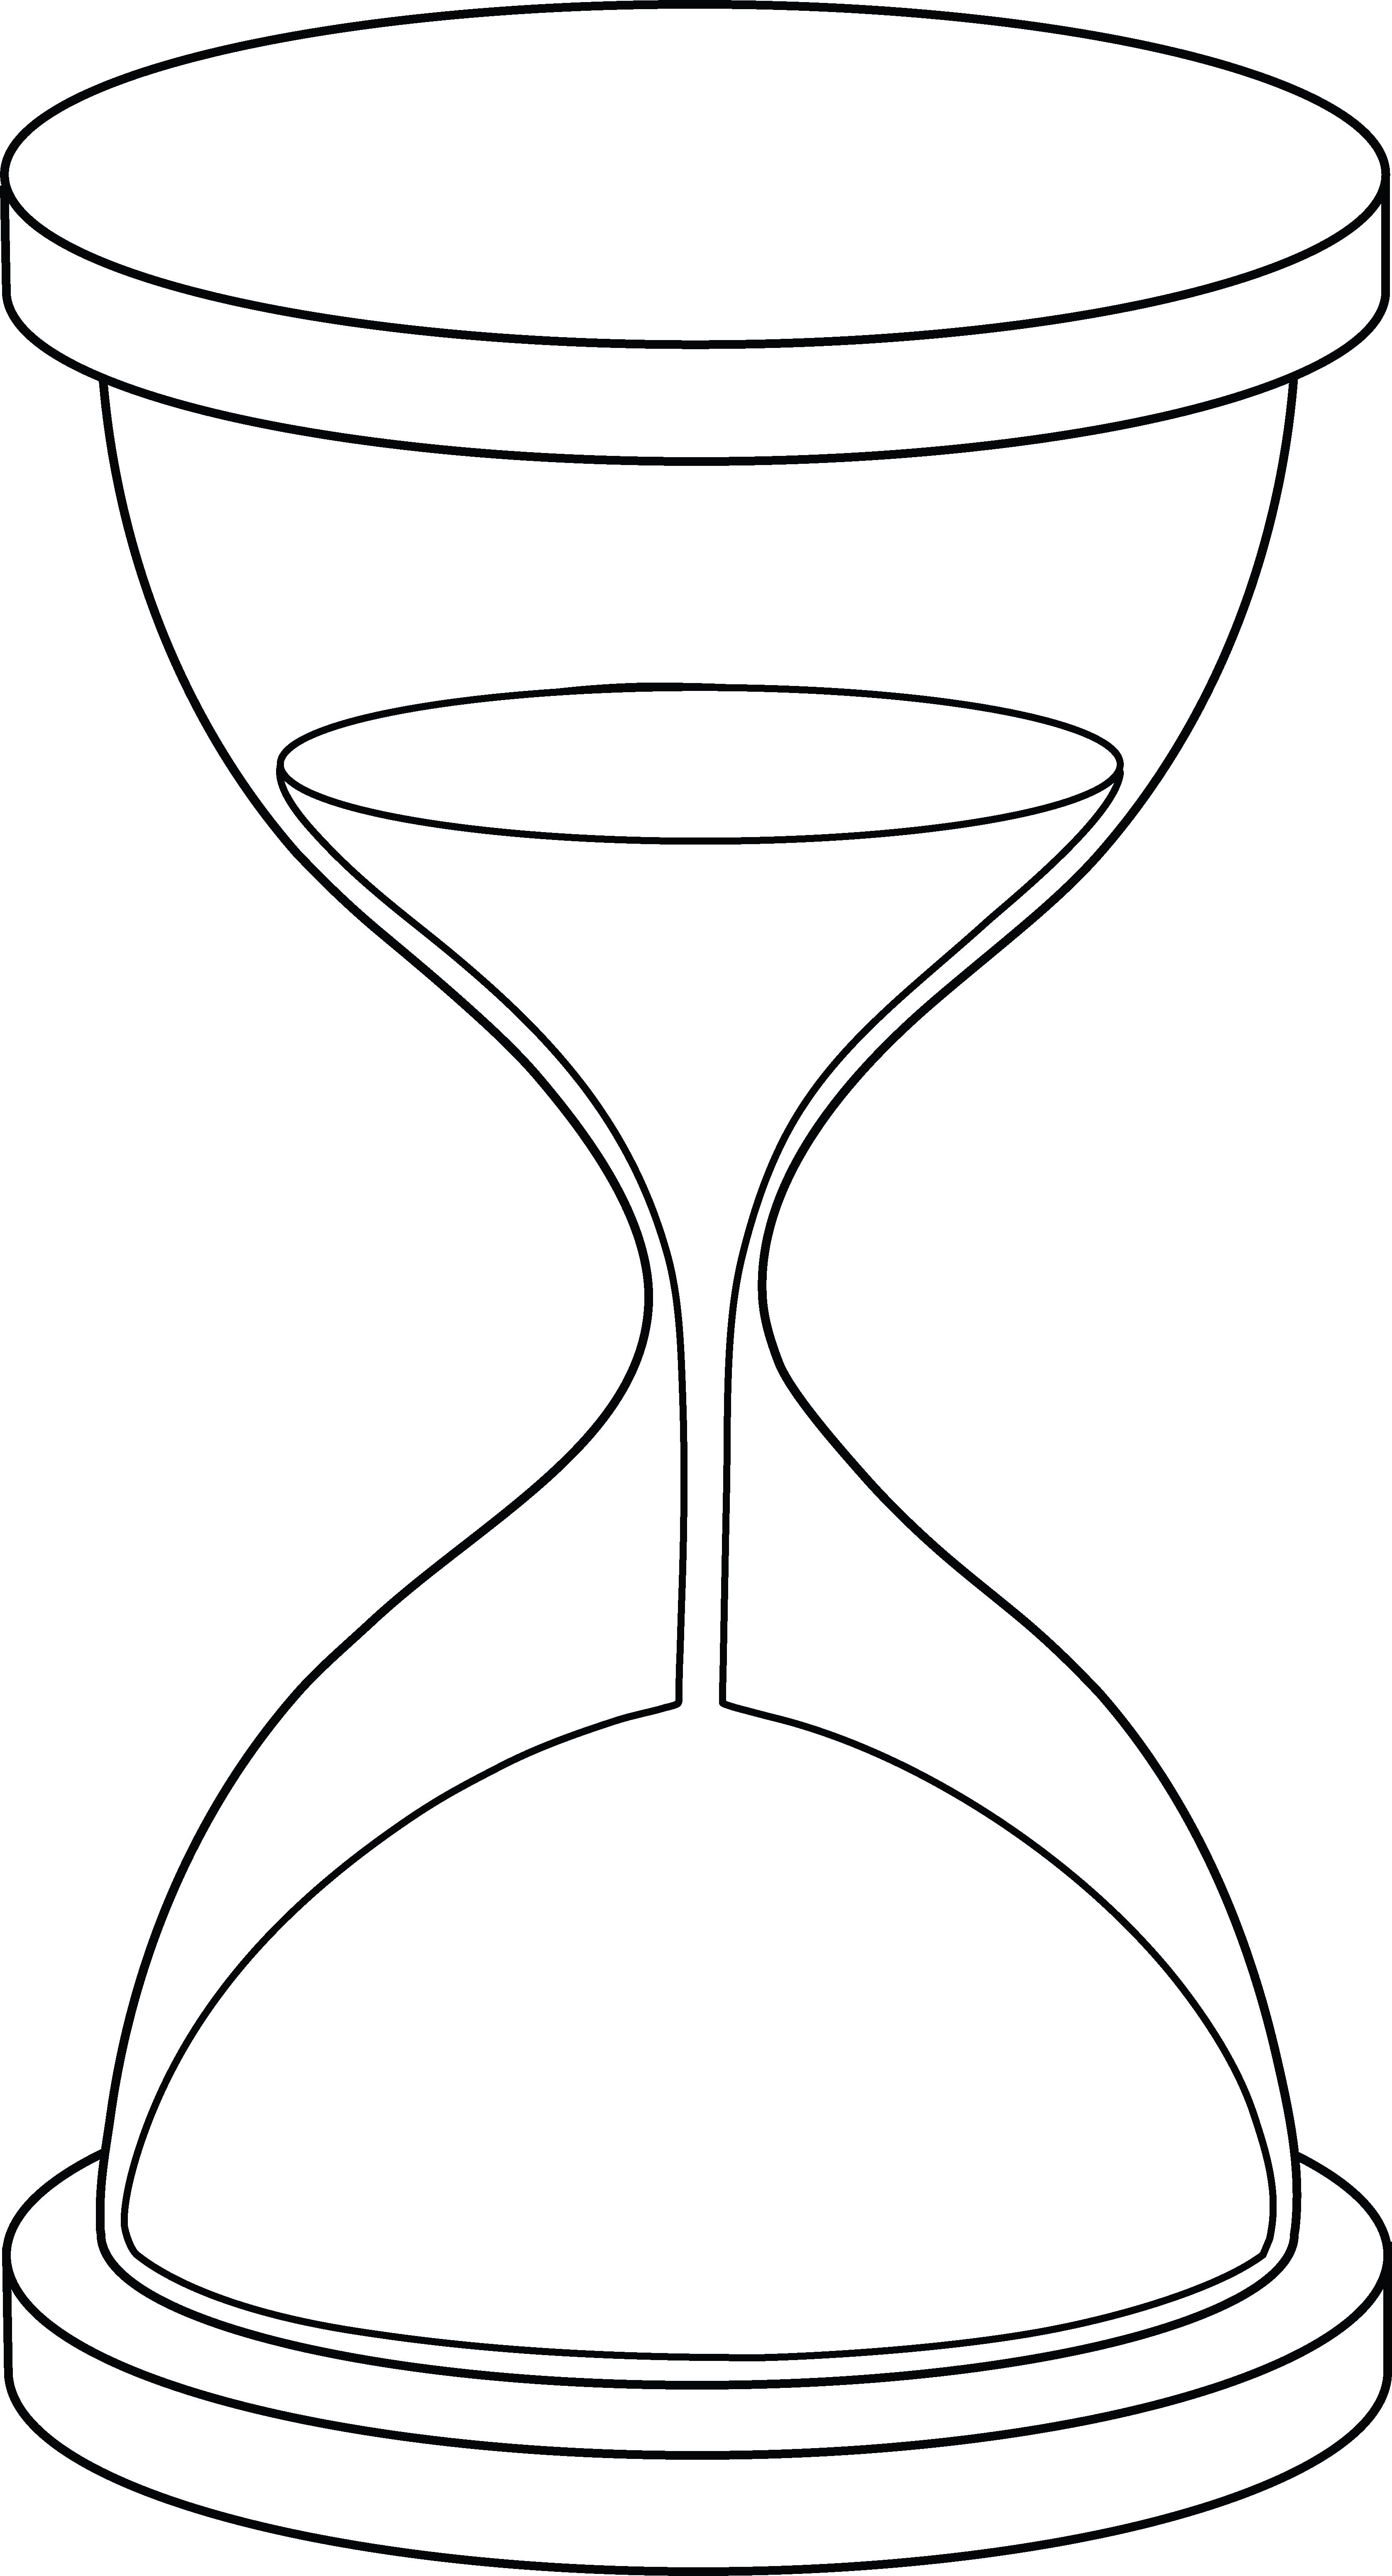 Hourglass Line Art.